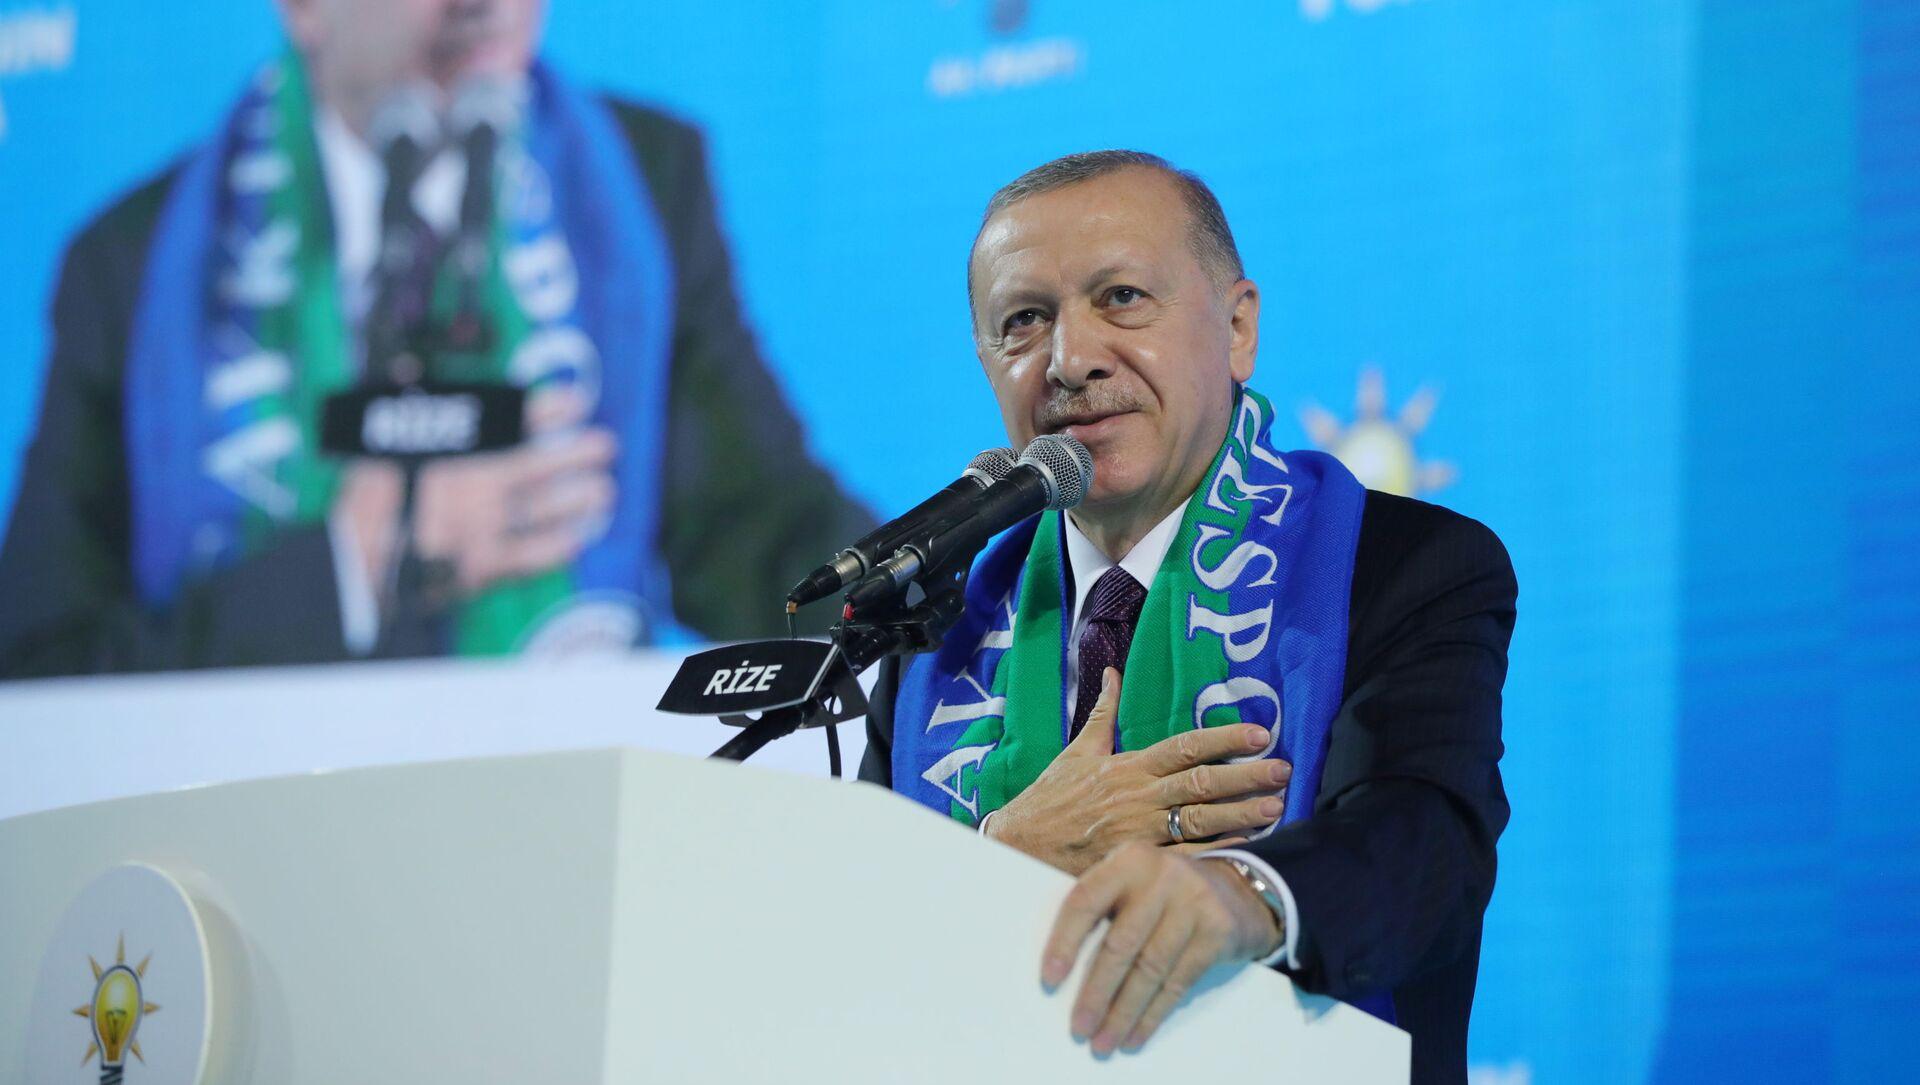 Президент Турции Реджеп Тайип Эрдоган, фото из архива - Sputnik Azərbaycan, 1920, 27.08.2021